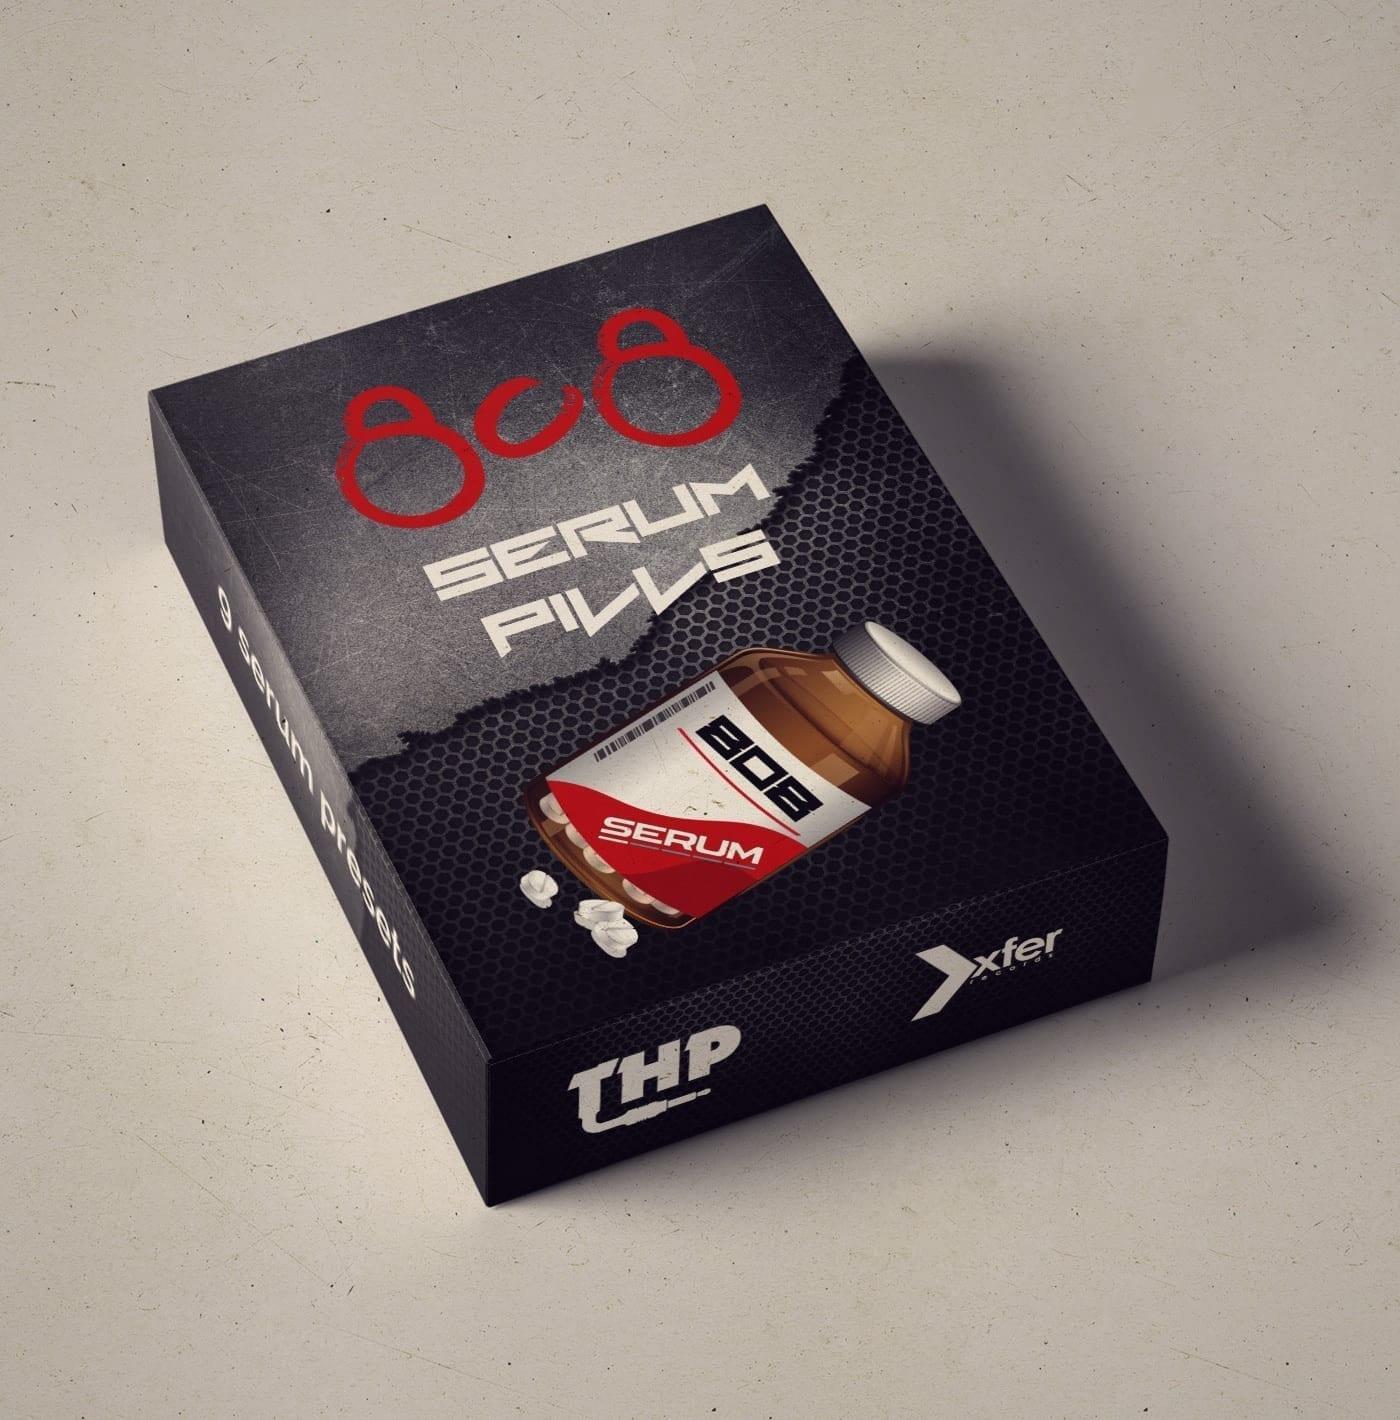 808 Serum Pills - 9 Free 808 Serum Presets | The Highest Producers